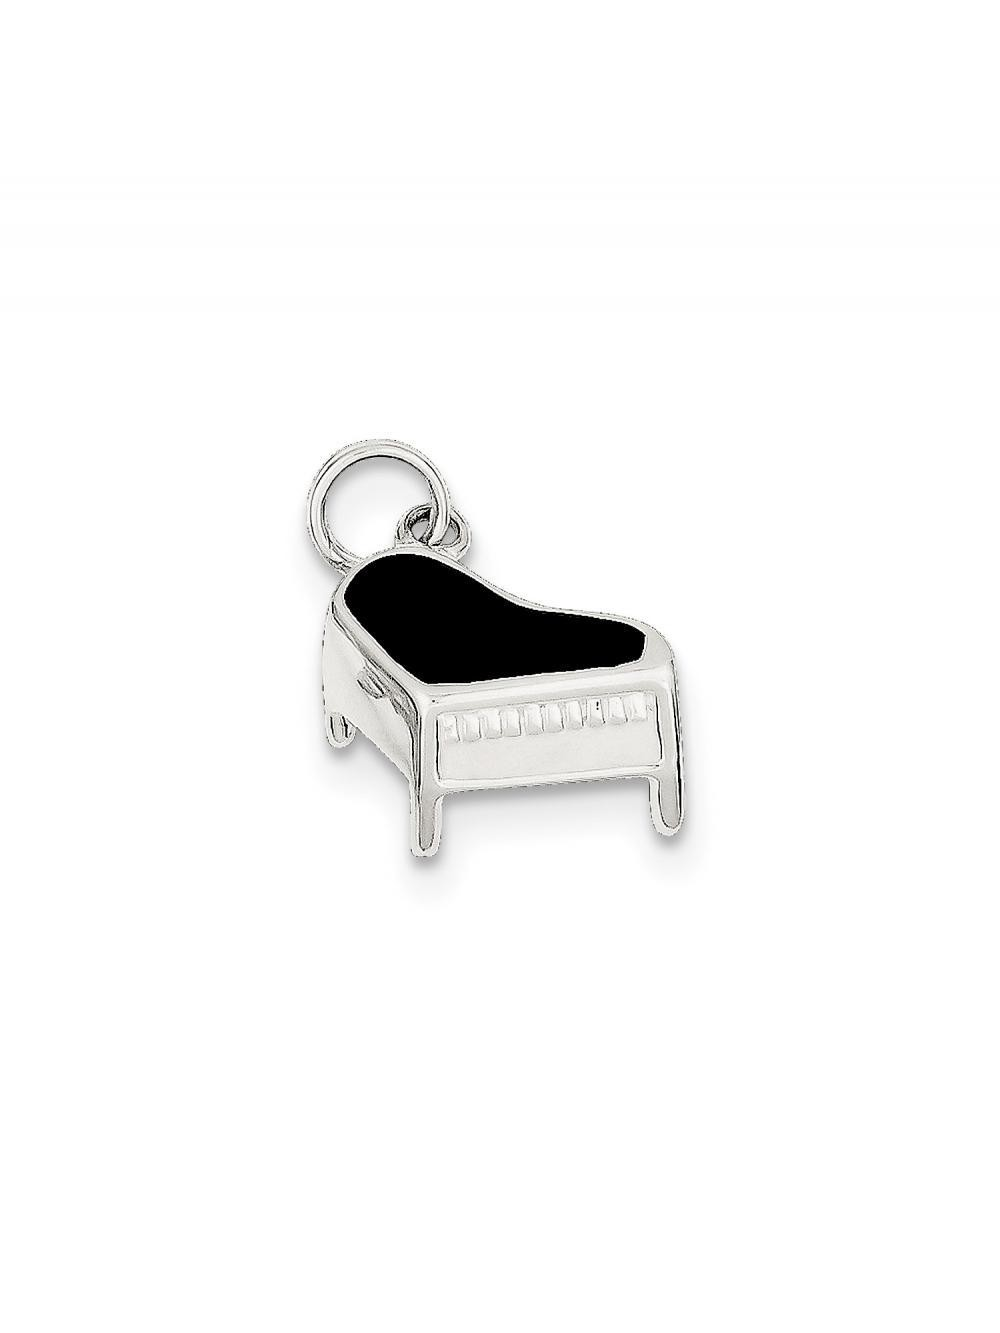 925 Sterling Silver Black Enamel Piano Charm Pendant - 15mm